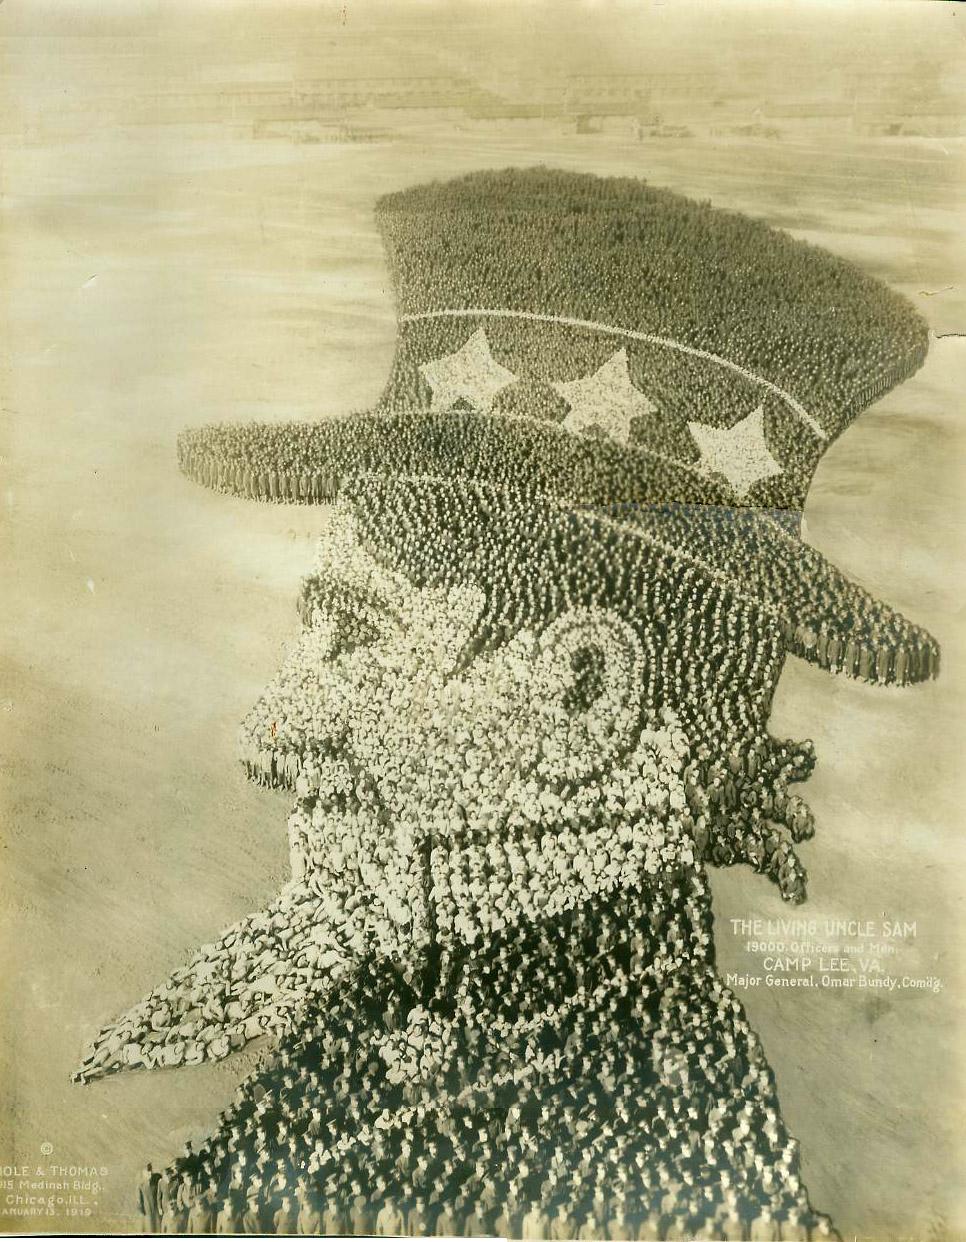 Wuj Sam (ang. Uncle Sam), 1919, Camp Lee VA - 19 000 oficerów